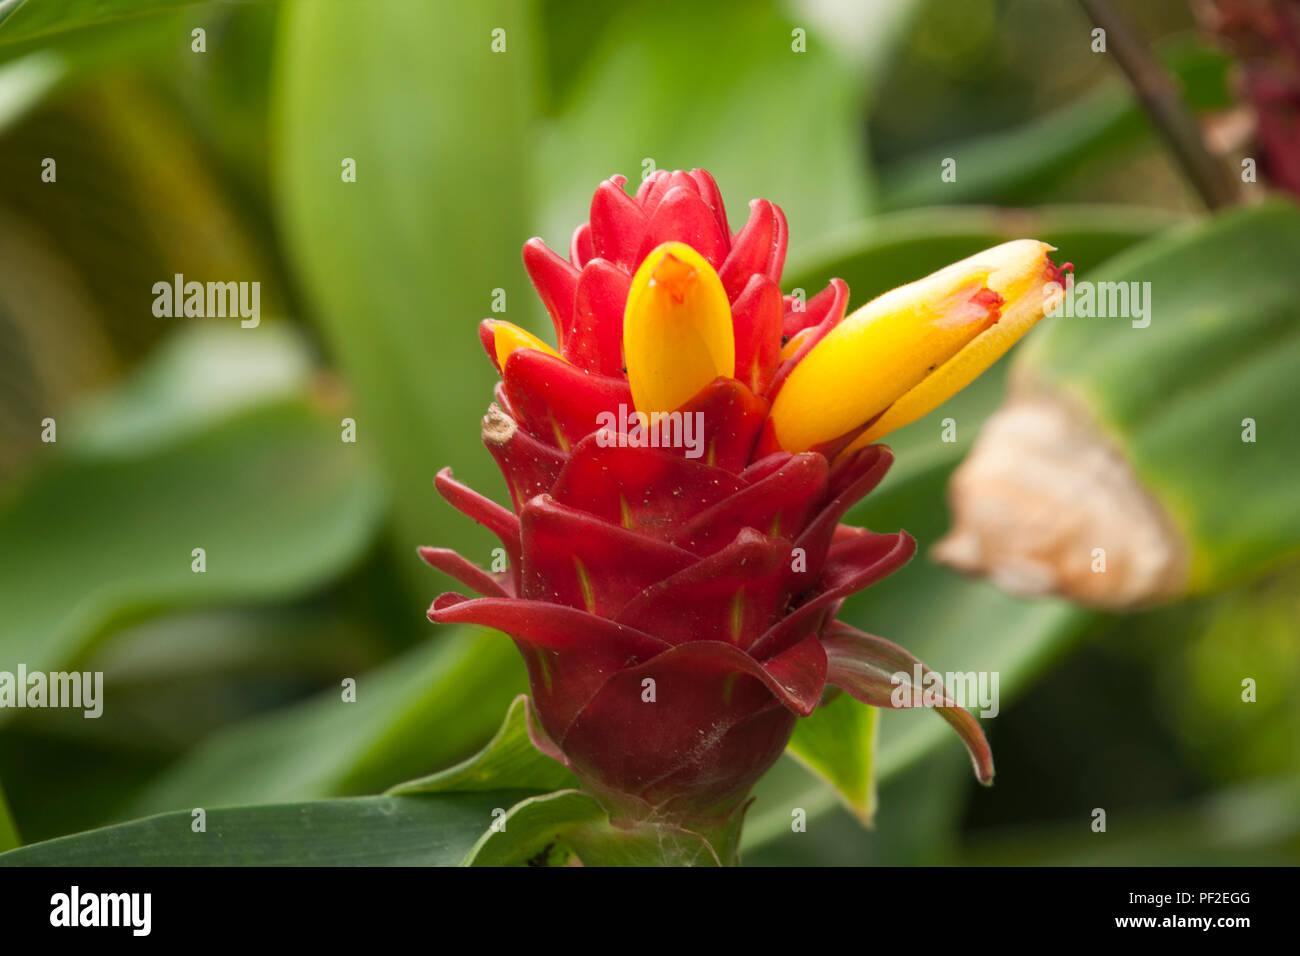 Yellow tubular flowers stock photos yellow tubular flowers stock sydney australia costus barbatus with red inflorescence and bright yellow tubular flowers native to costa mightylinksfo